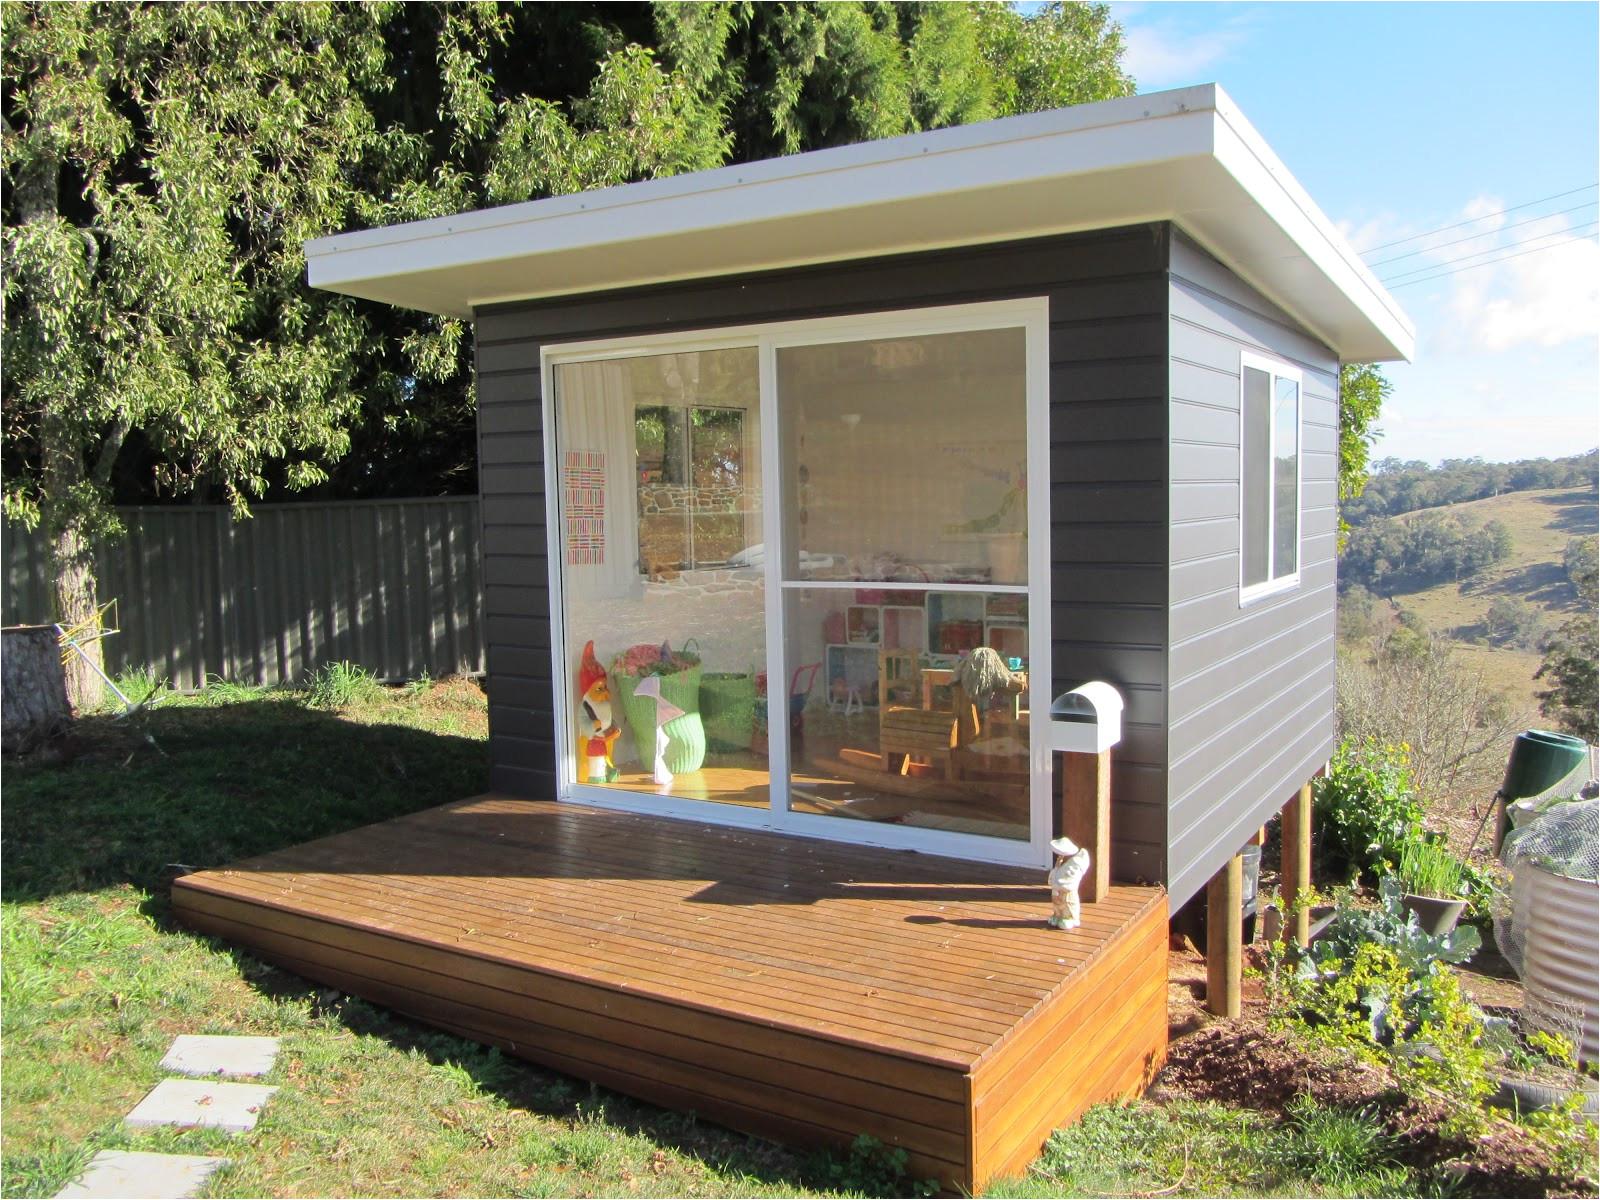 cubby house plans diy